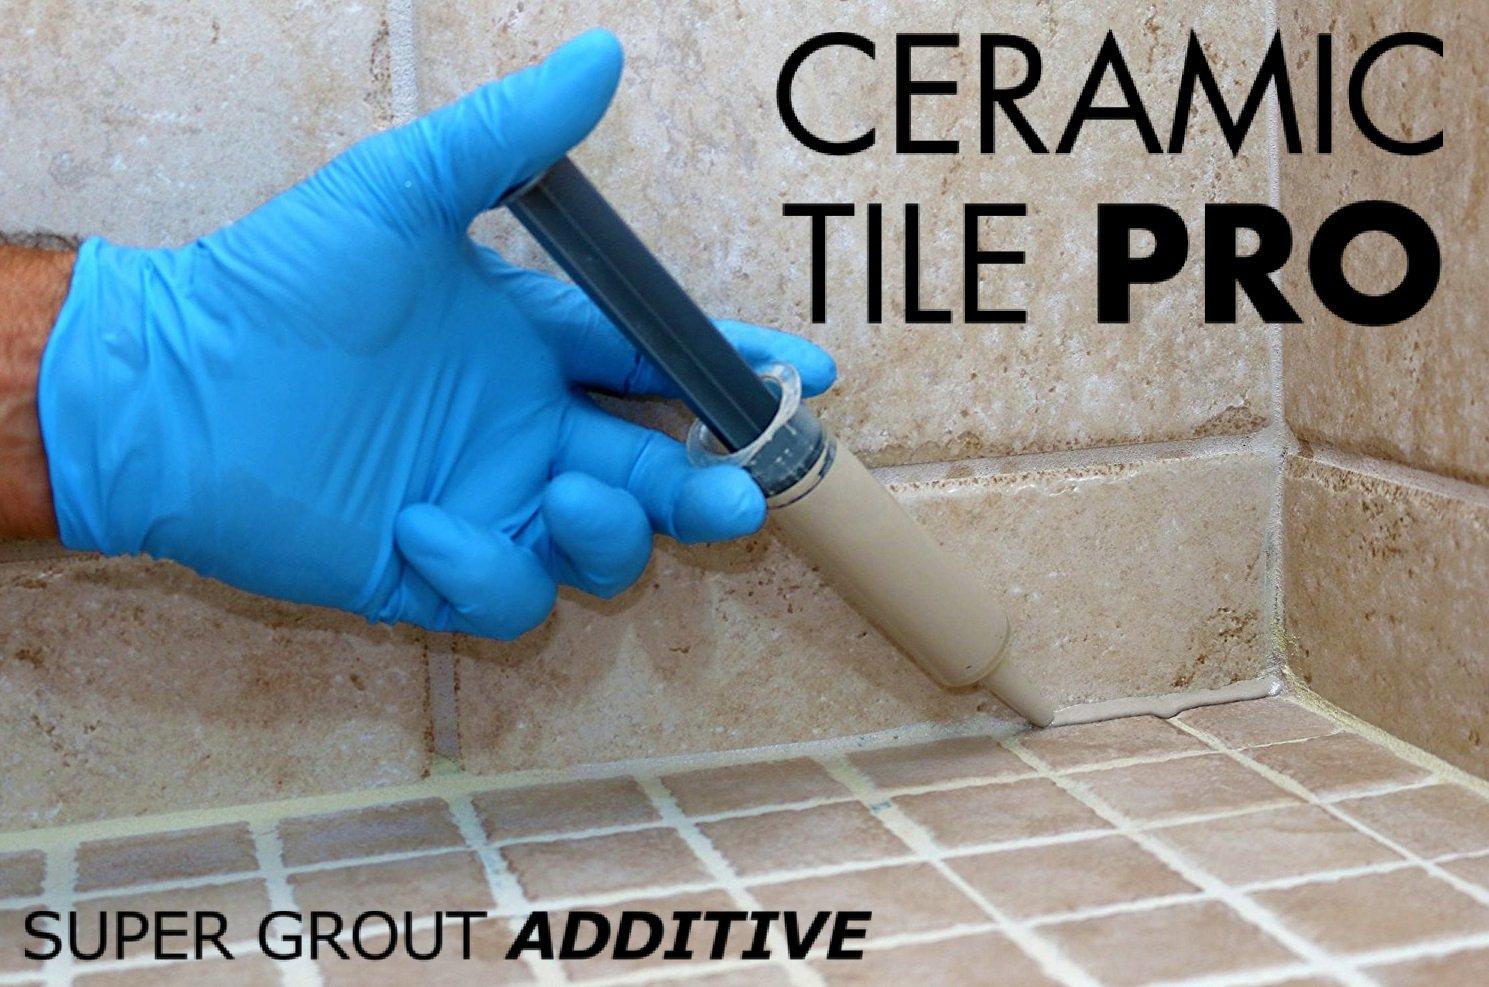 Super Grout Additive by CERAMIC TILE PRO (Image #5)